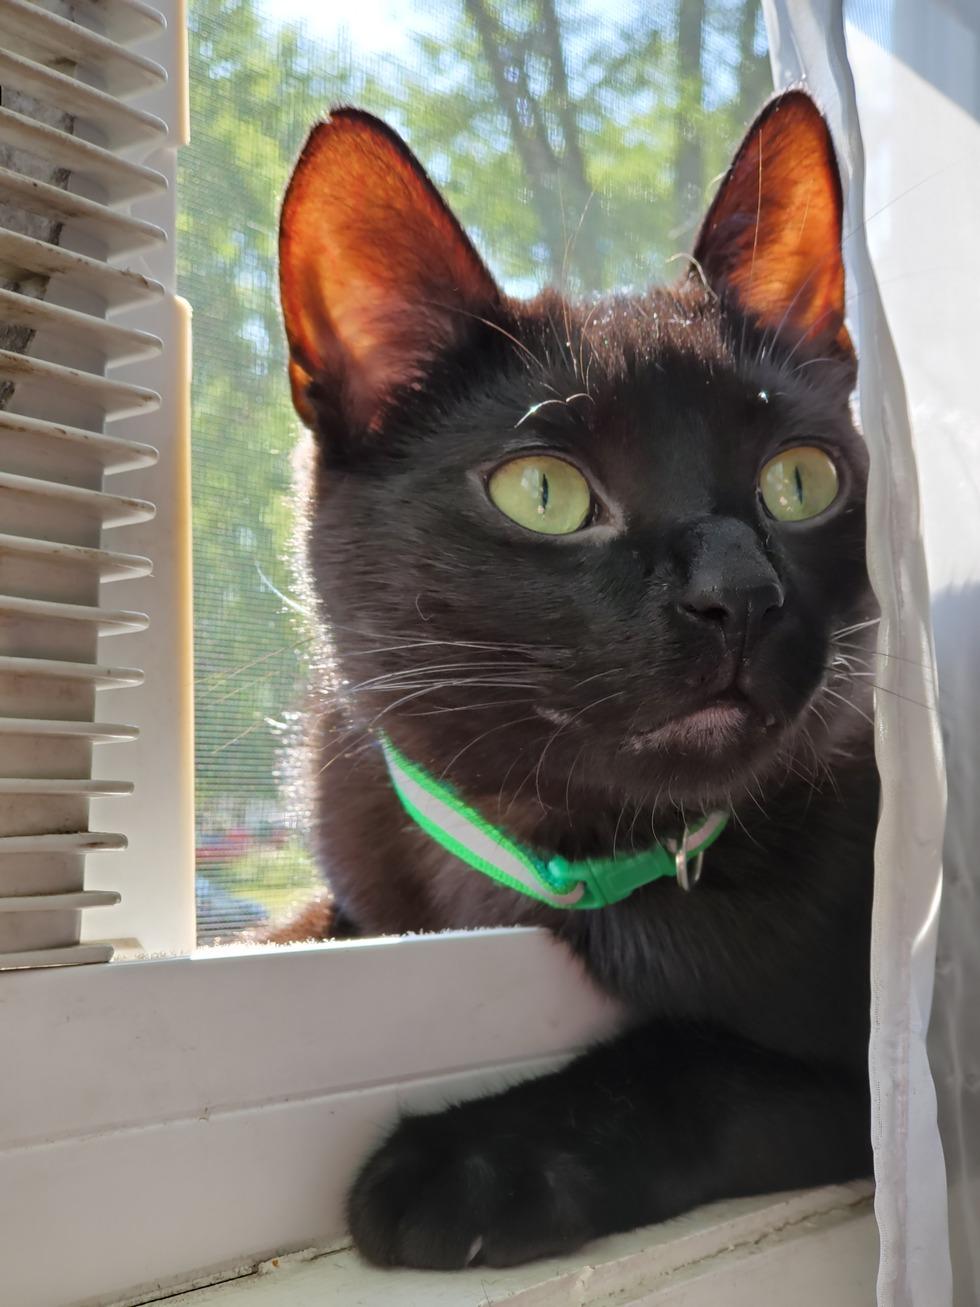 Vote for Binx   2021 Community of Cats Cat Calendar Contest